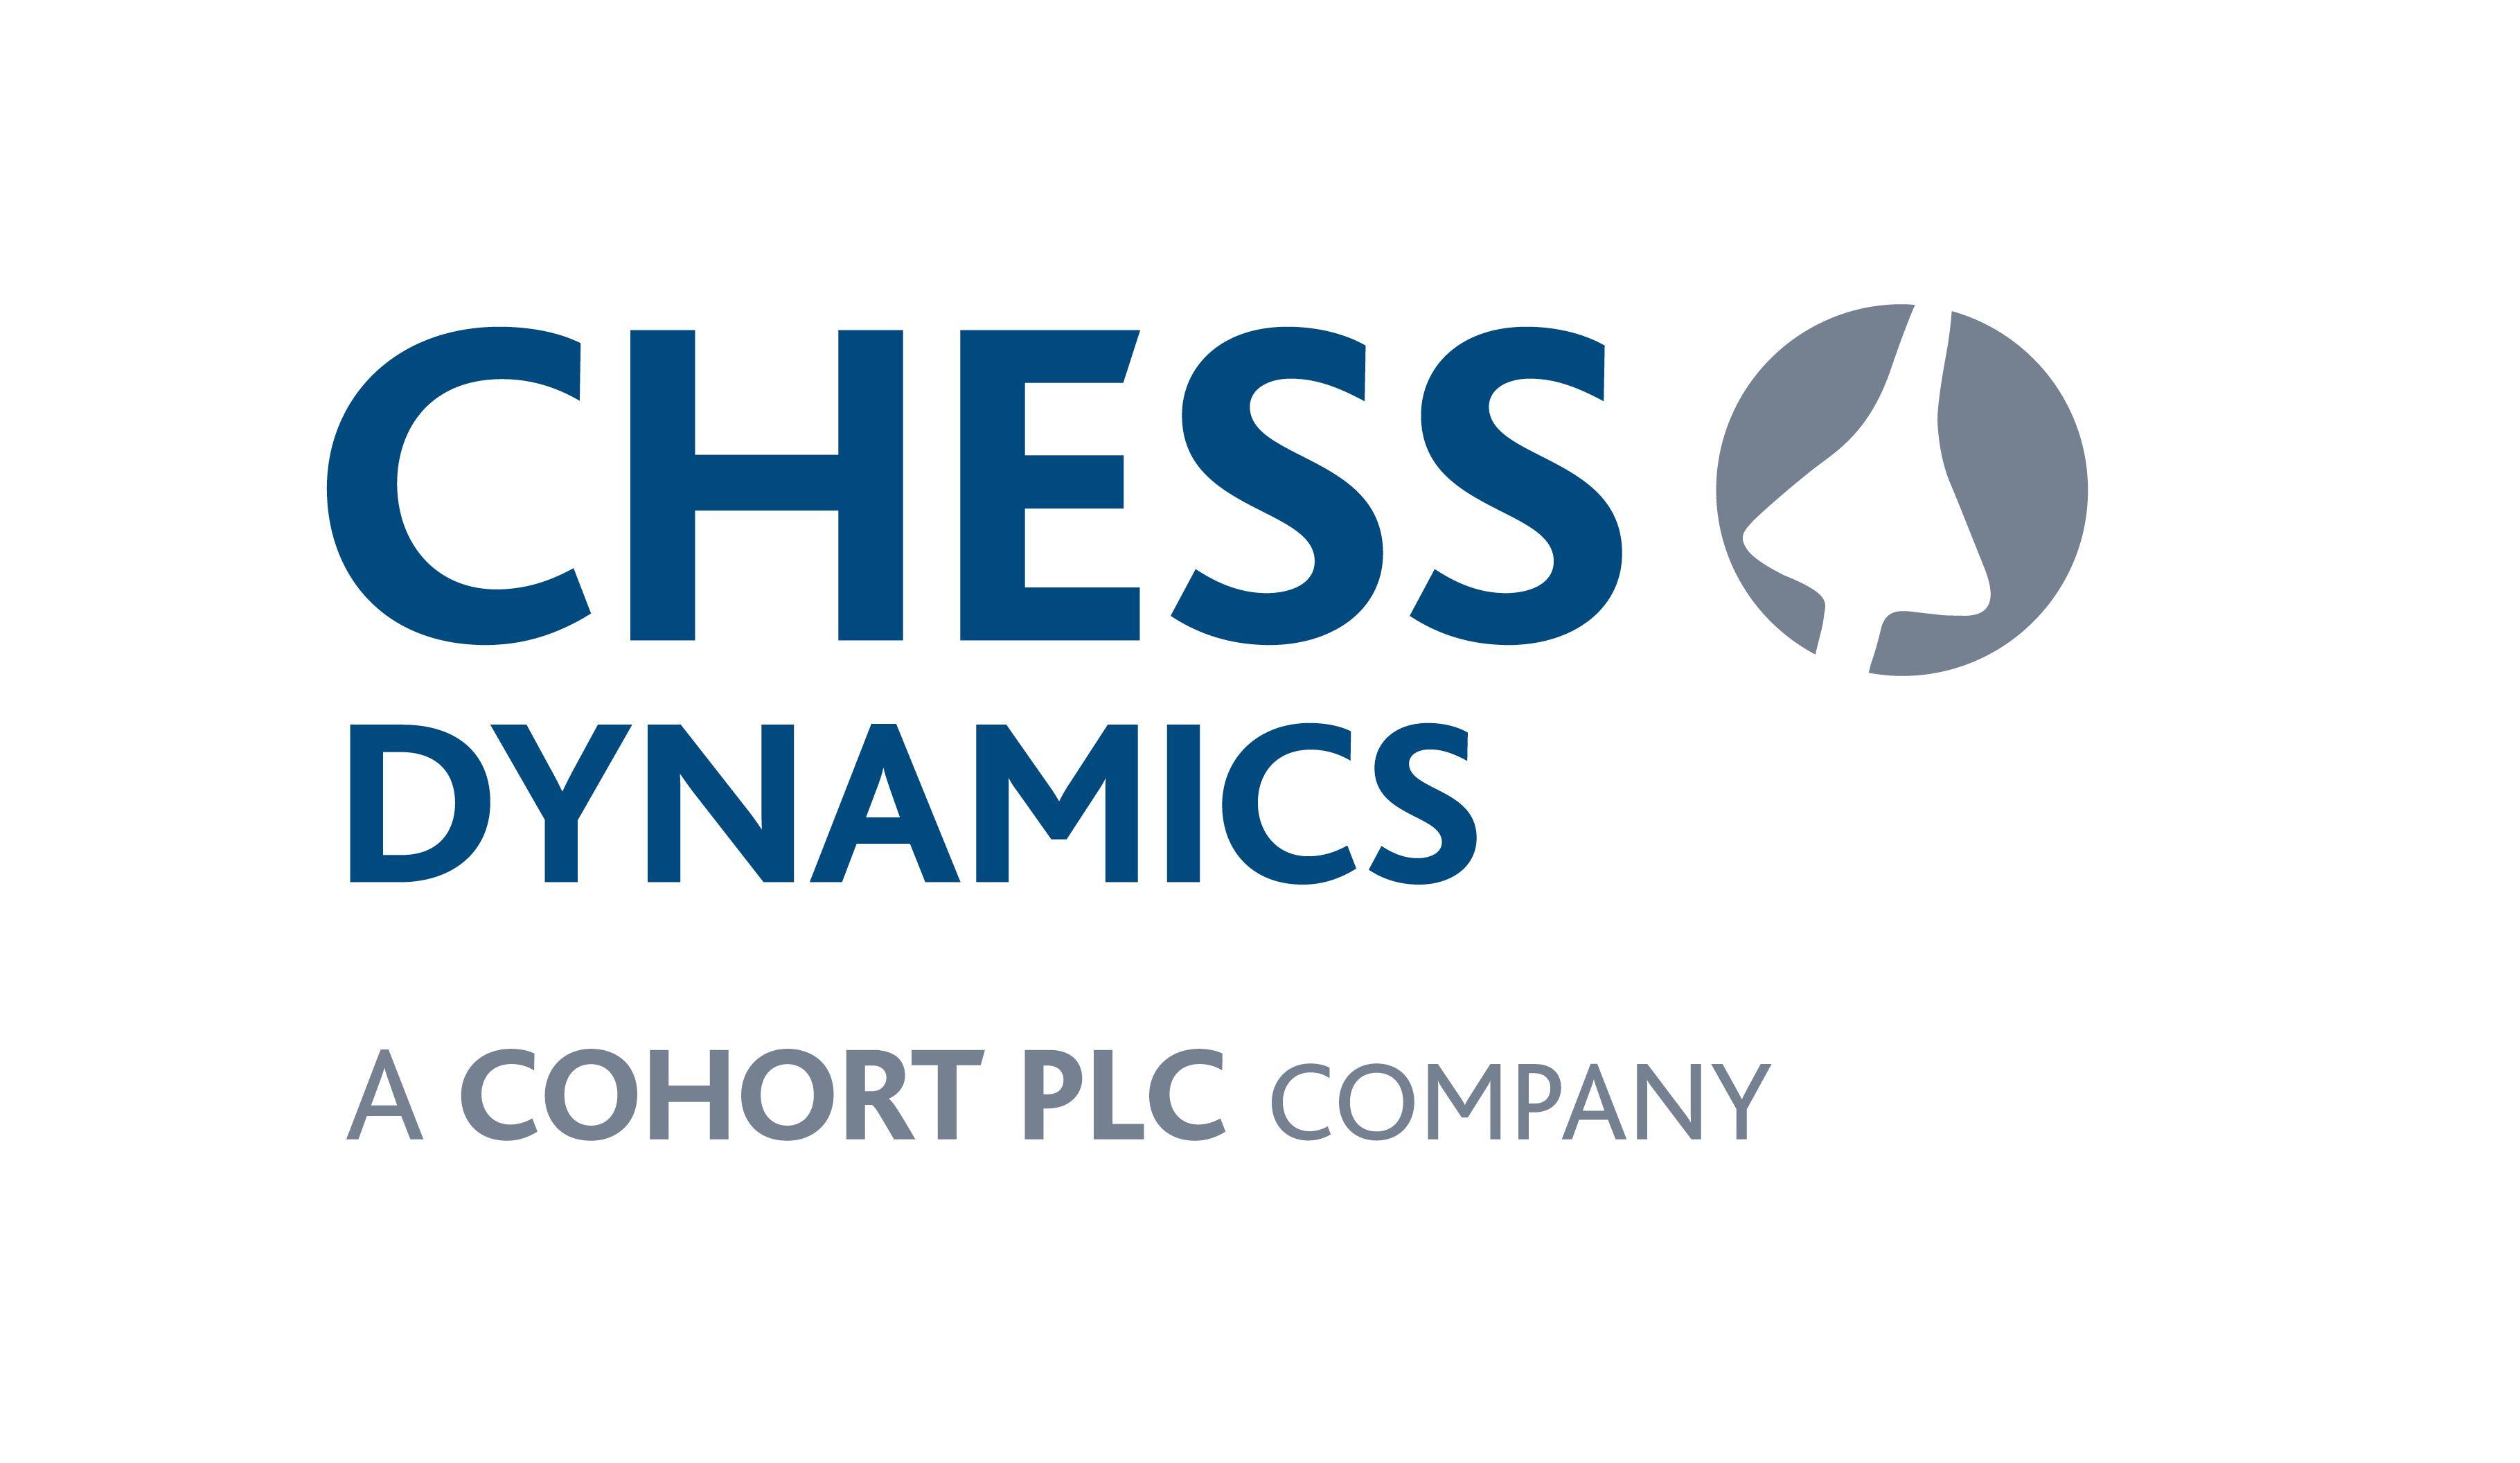 Chess Dynamics